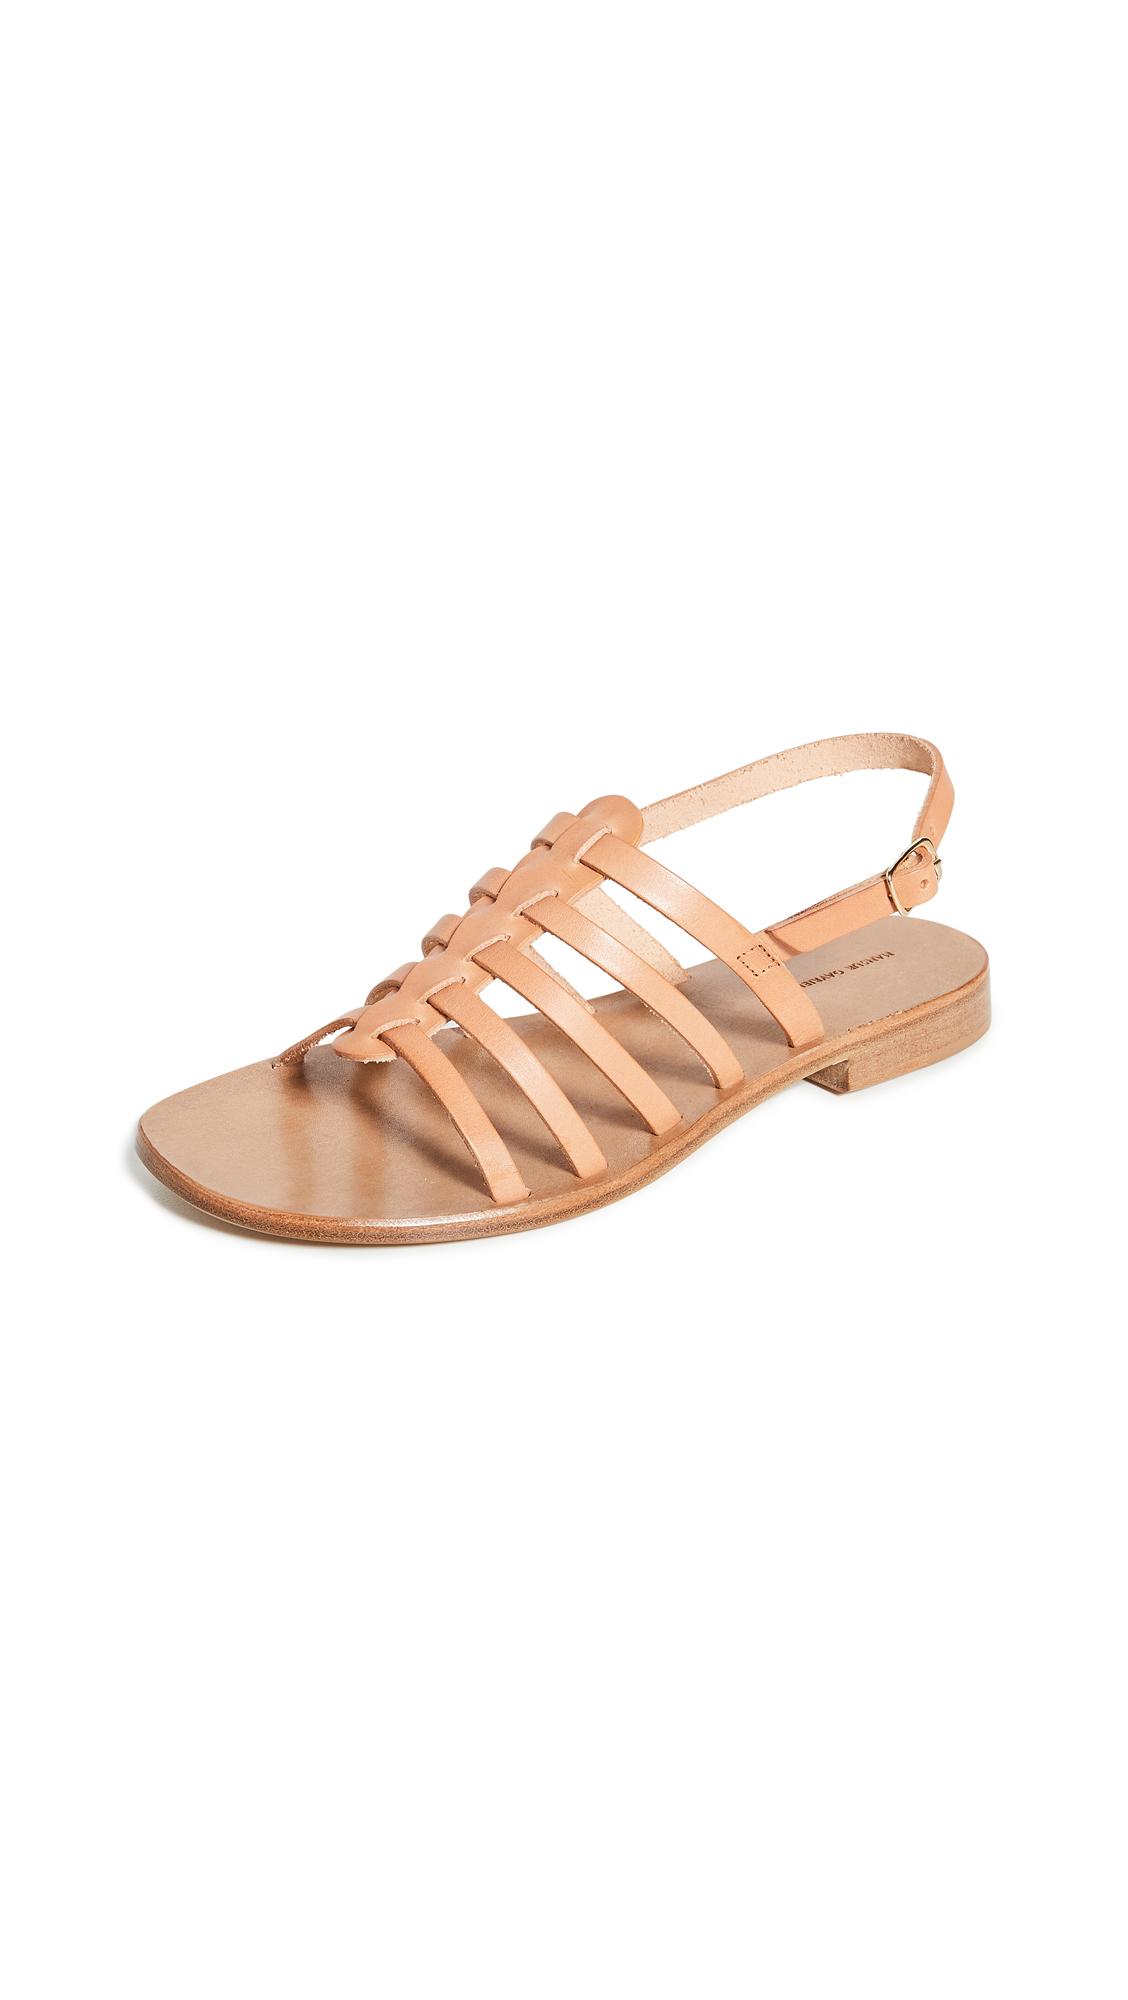 Buy Mansur Gavriel Campania Fino Sandals online, shop Mansur Gavriel